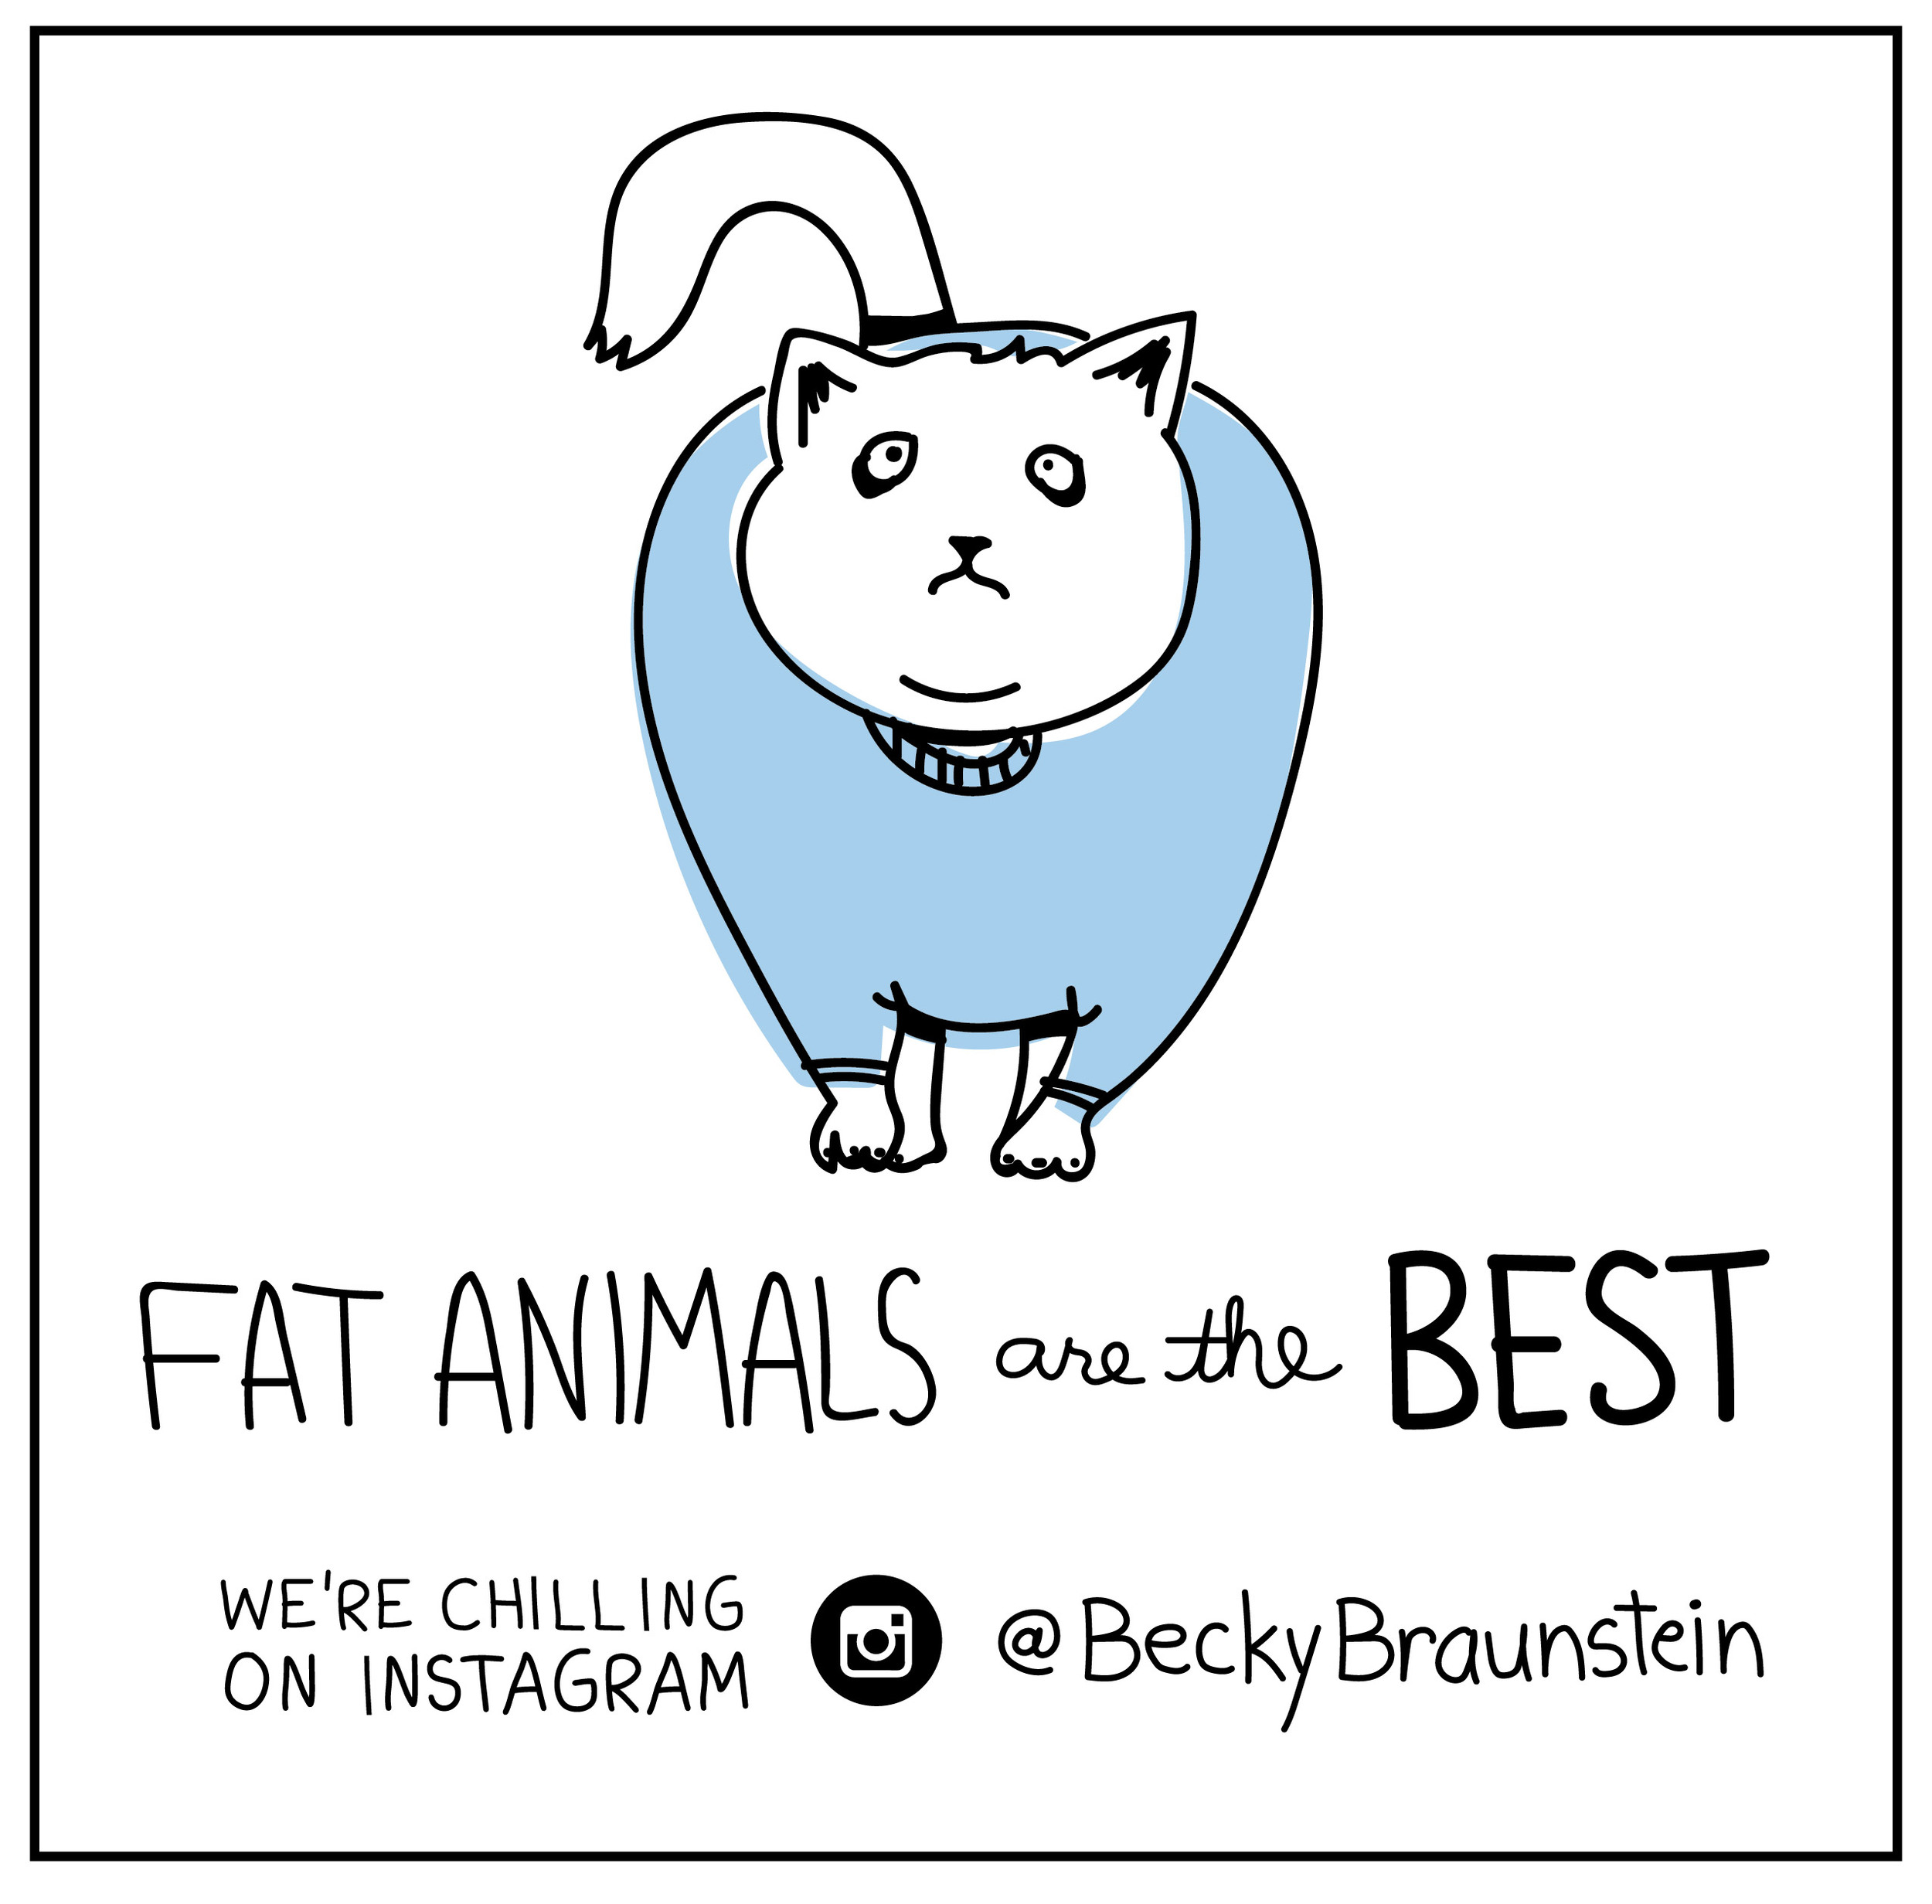 Fat animals Promo.jpg